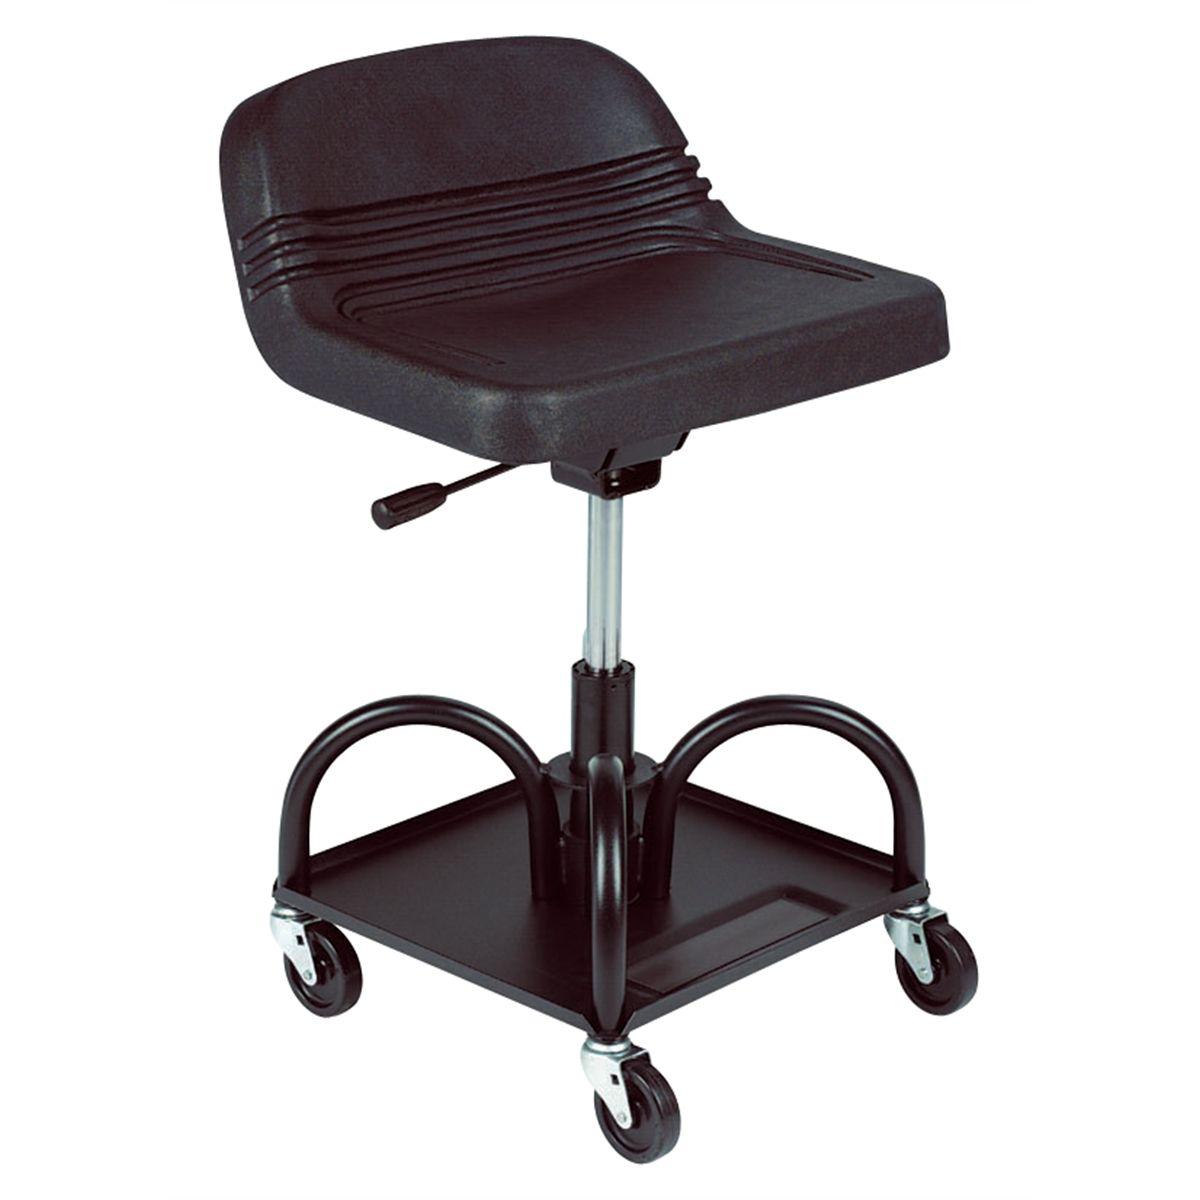 Tremendous Adjustable Pneumatic Creeper Seat Ibusinesslaw Wood Chair Design Ideas Ibusinesslaworg